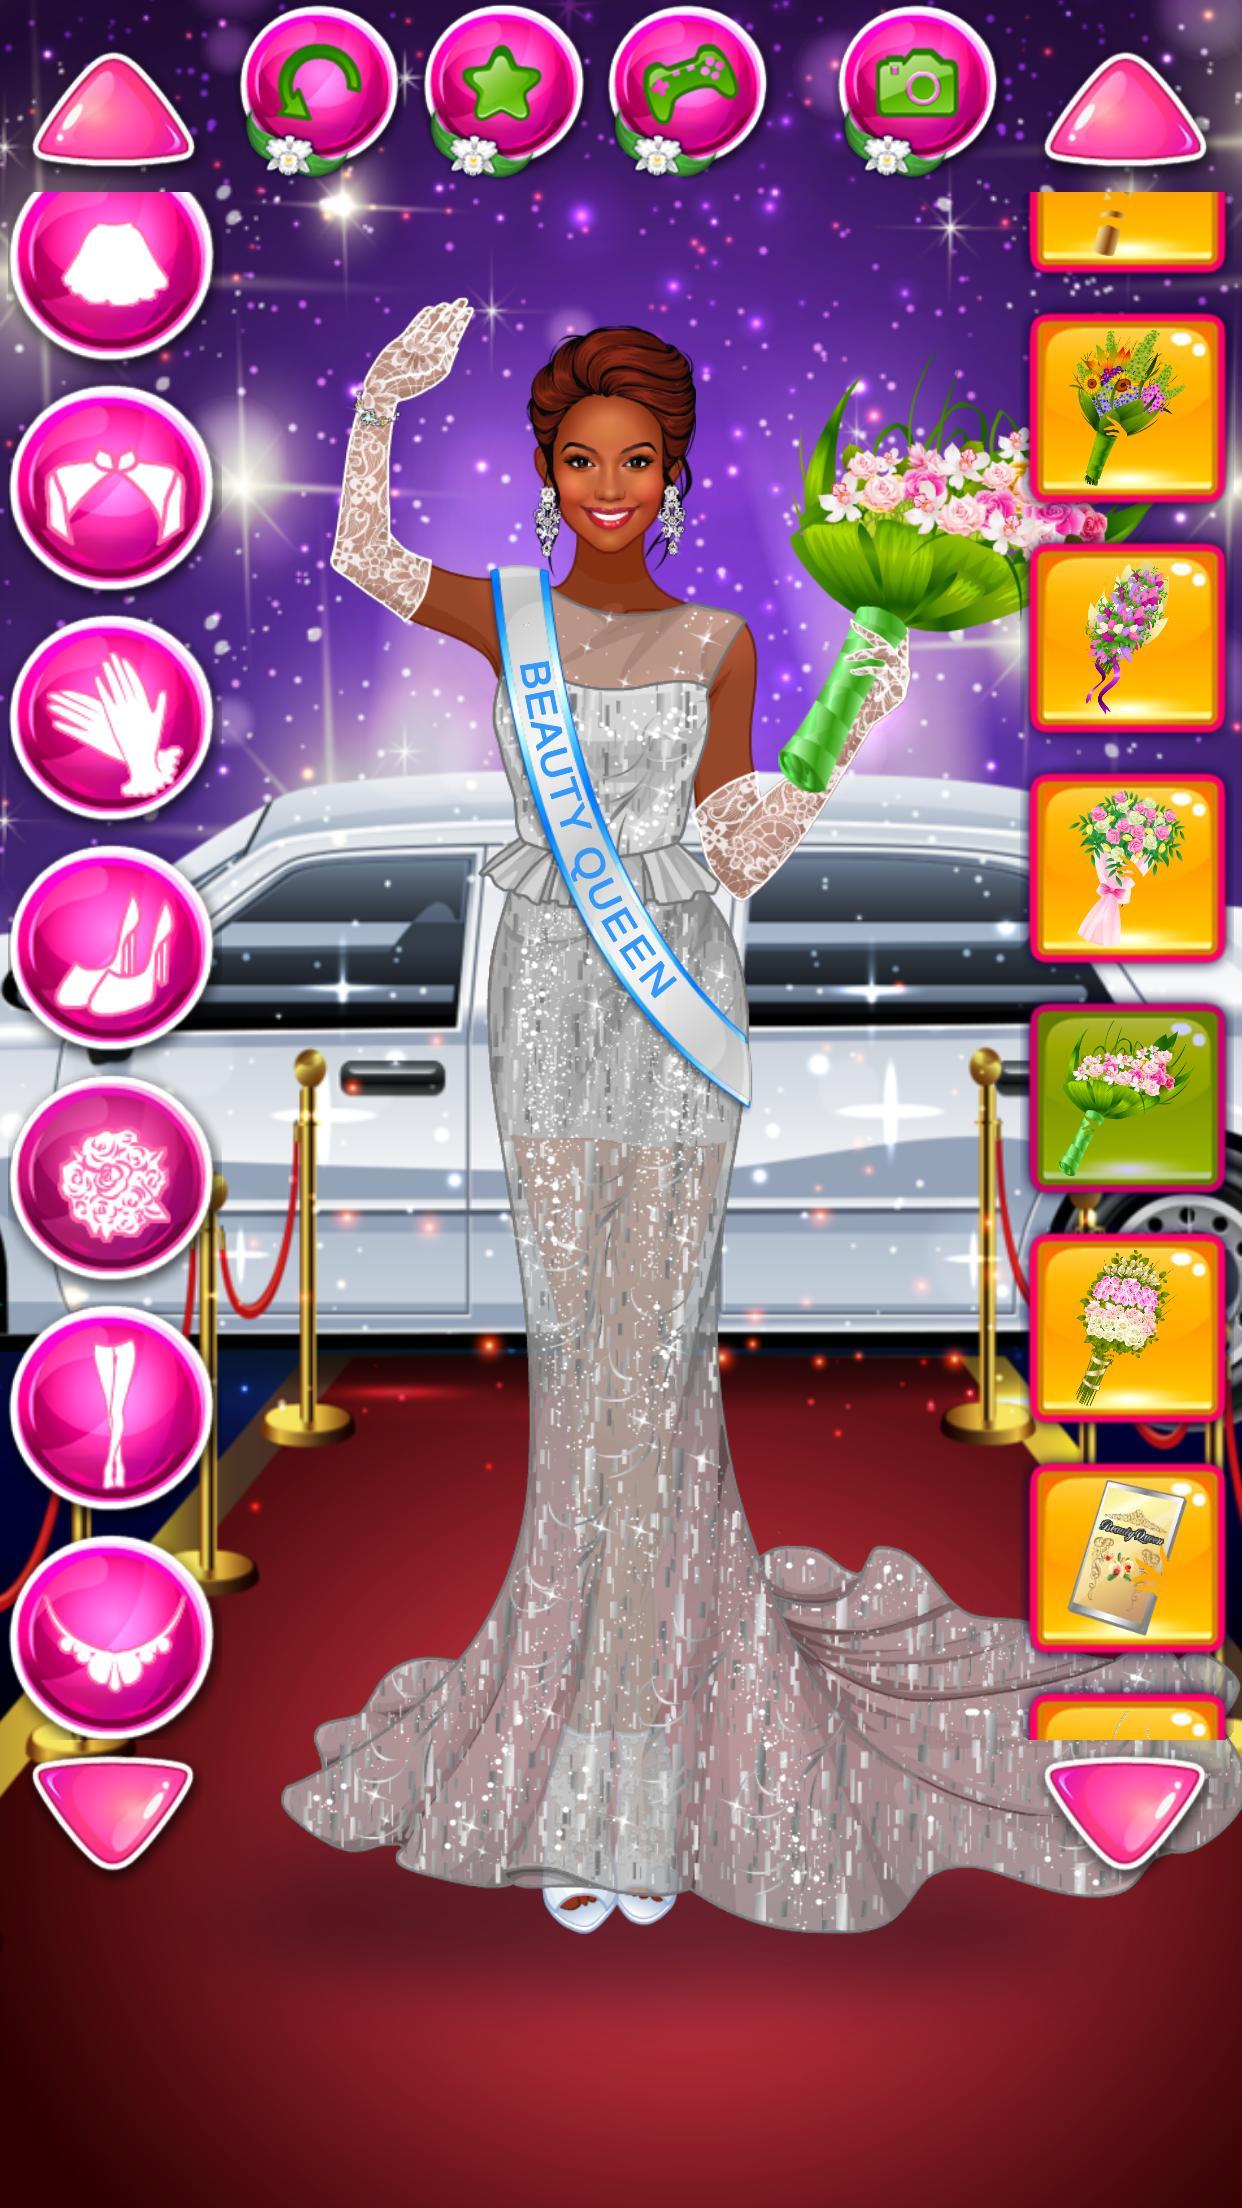 Beauty Queen Dress Up - Star Girl Fashion 1.1 Screenshot 24